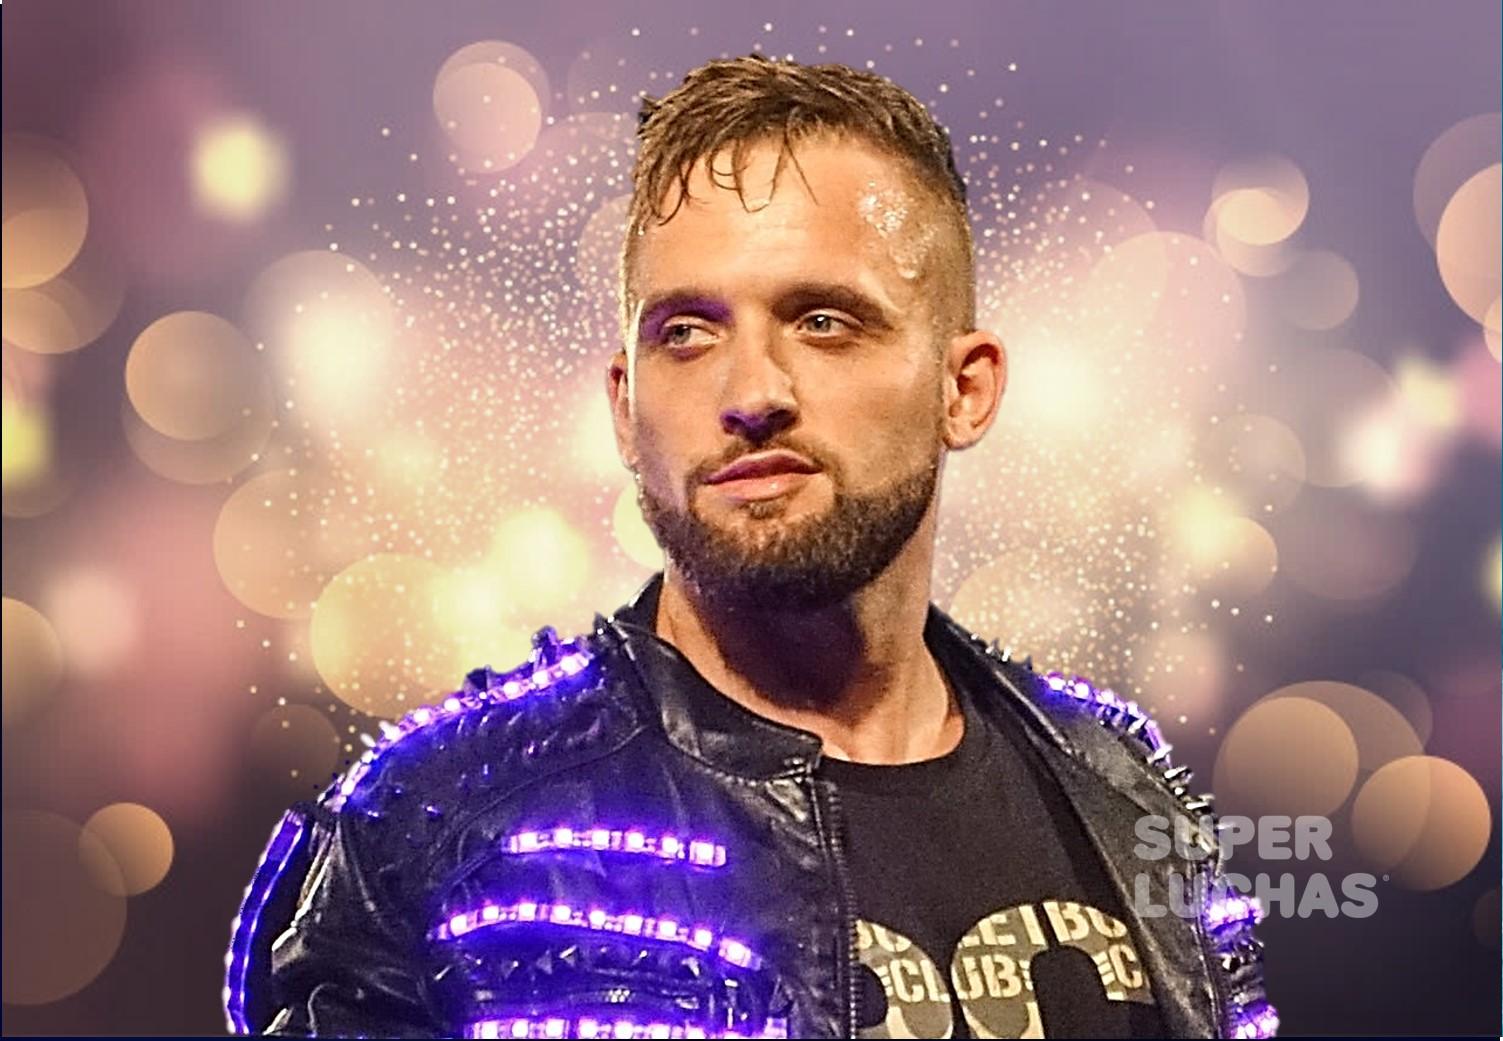 NJPW: El Phantasmo se disculpó por insulto público a Will Ospreay 1